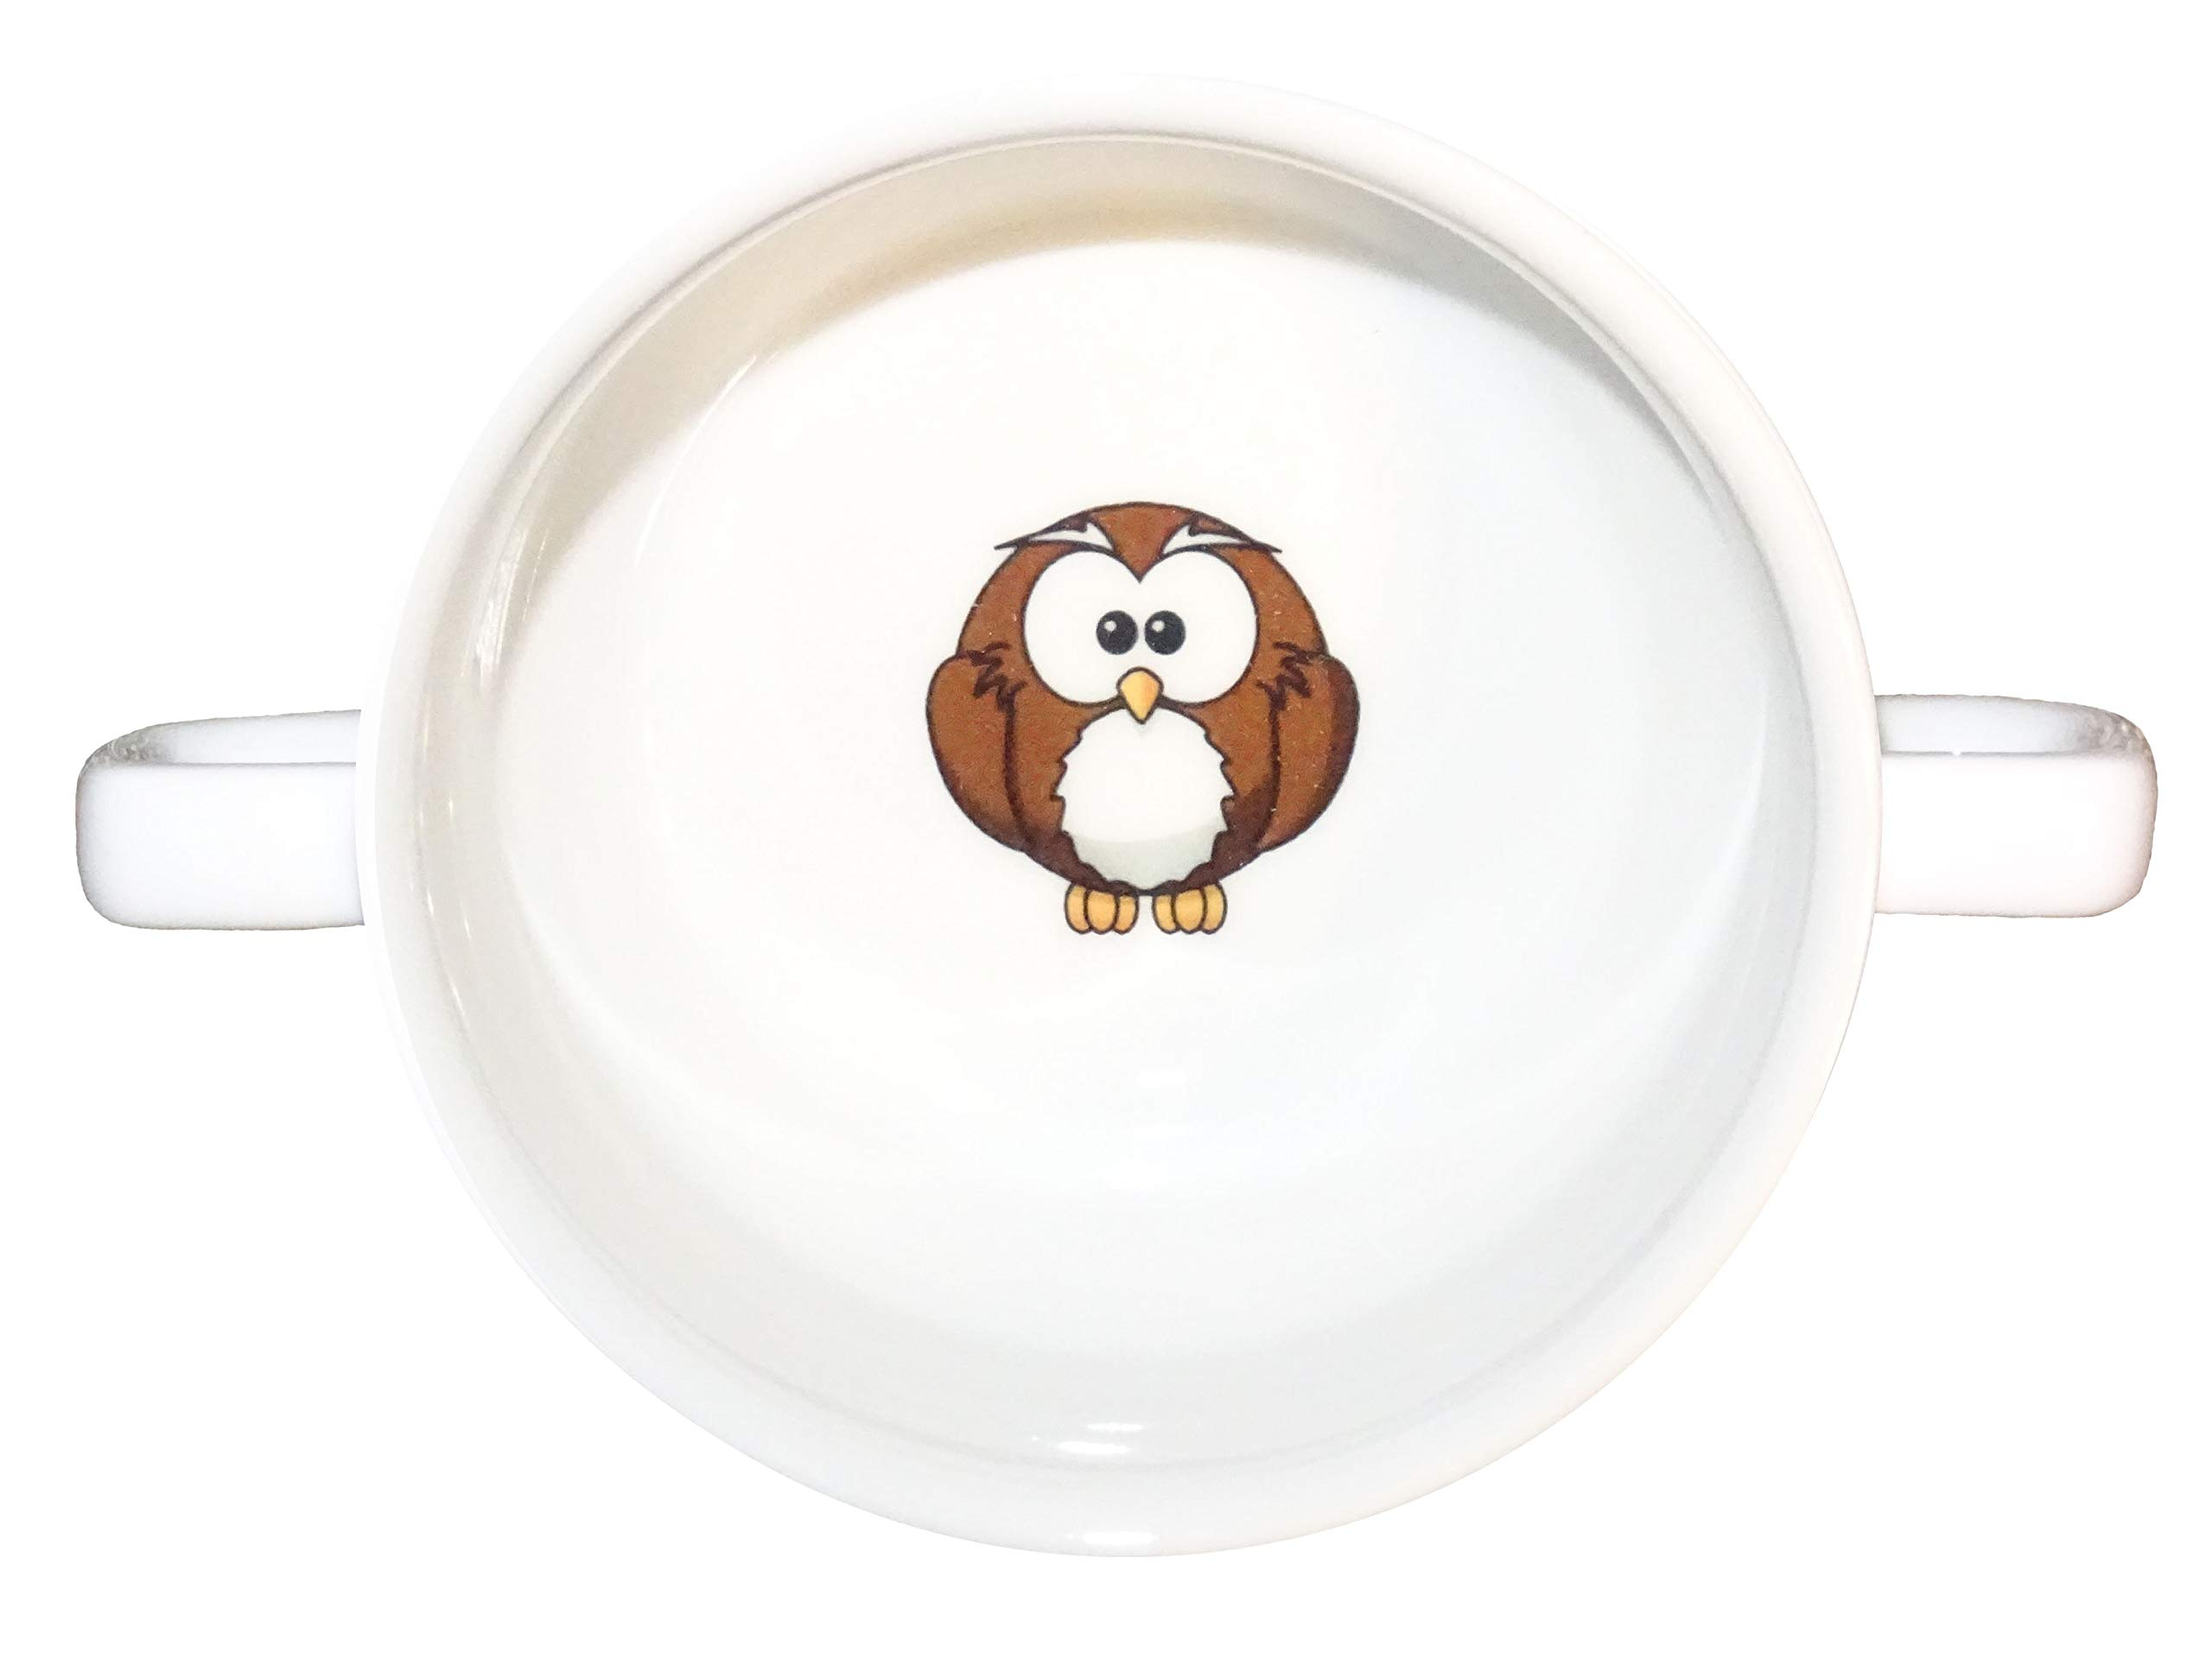 Soup Bowl 12, 1 pcs, owl family soup bowl small baby child kids , Bottom, hidden message, secret message, animal , bird , cartoon , Cartoon Animals, Good Cartoon Drawings, KIDS, owl , owls, porcelain